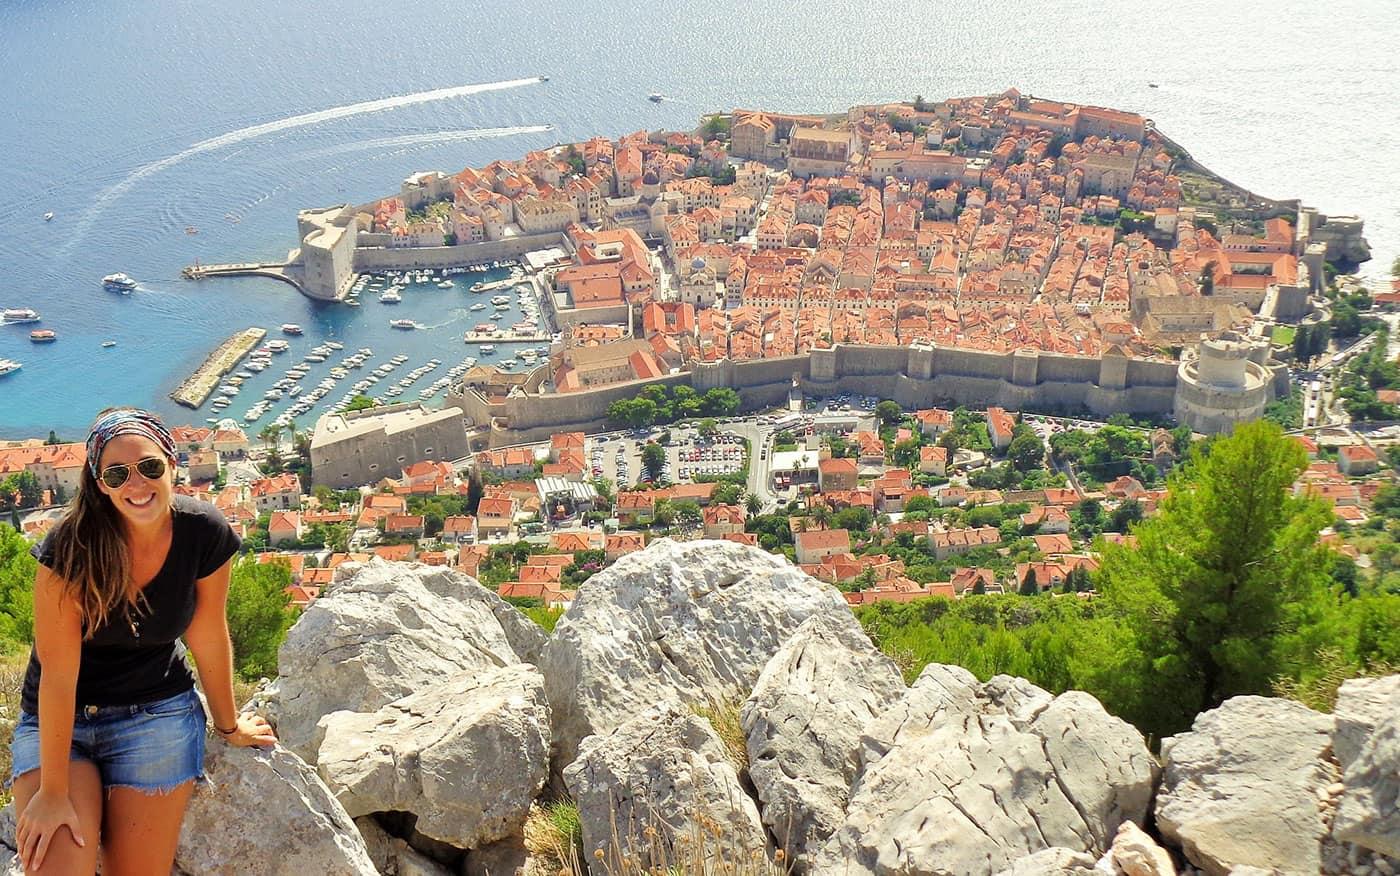 asistencia-al-viajero-europa,-seguro-de-viaje,-Schengen,-obligatorio,-croacia,-viajeydescubra,-seguro-barato